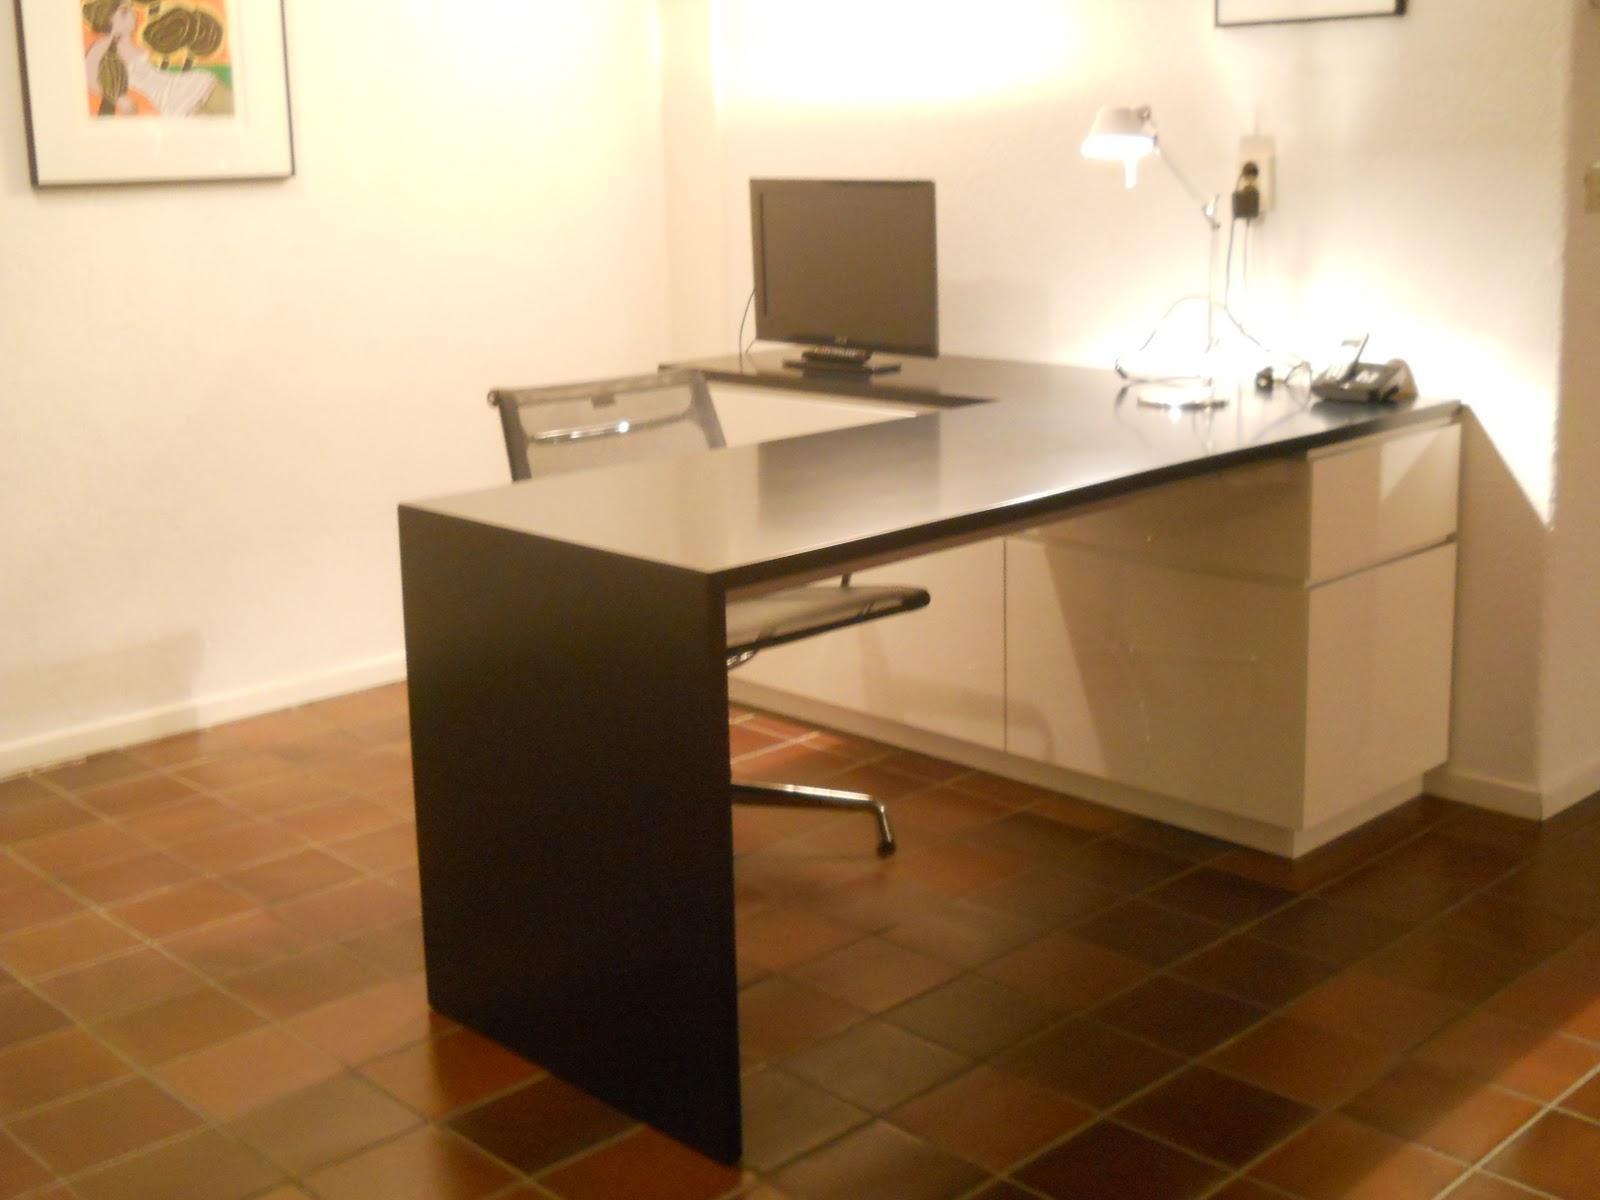 Interlübke Cube werkplek   Ploemen Interieur